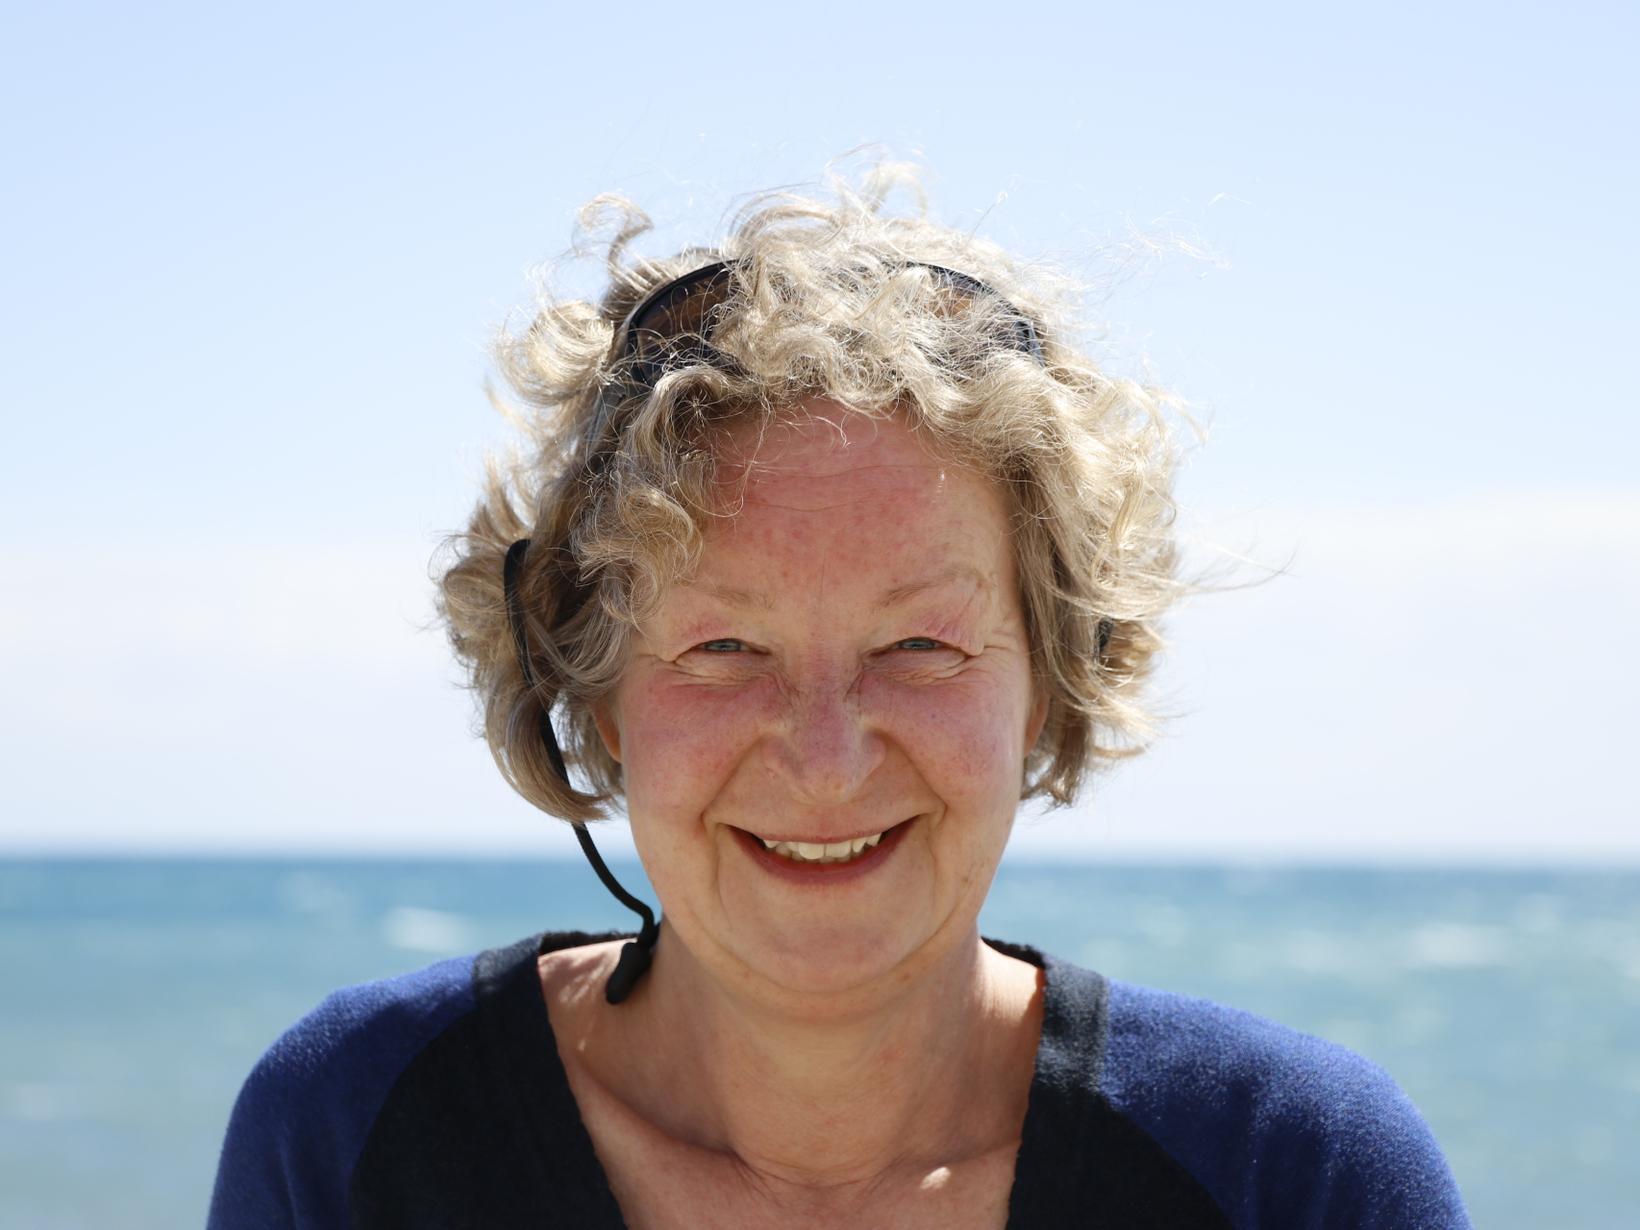 Carole from Enschede, Netherlands